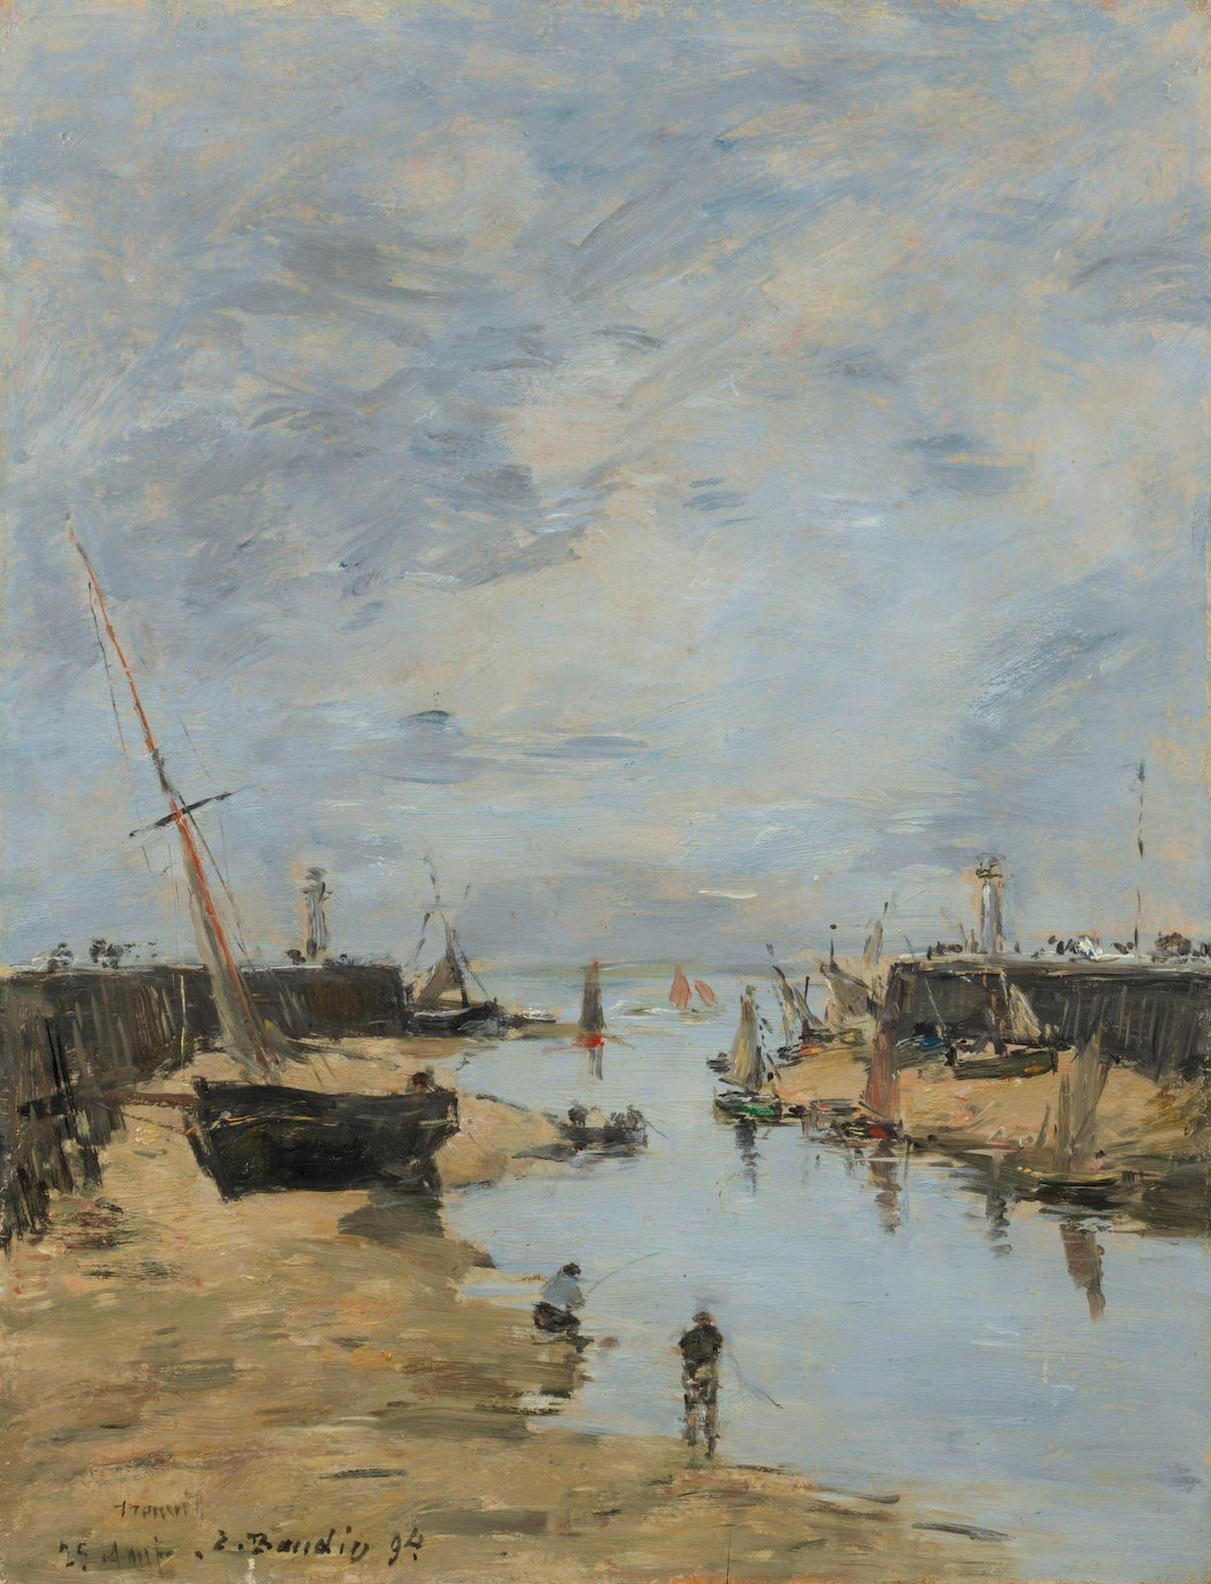 Eugene Louis Boudin-Jetees De Trouville, Maree Basse-1894